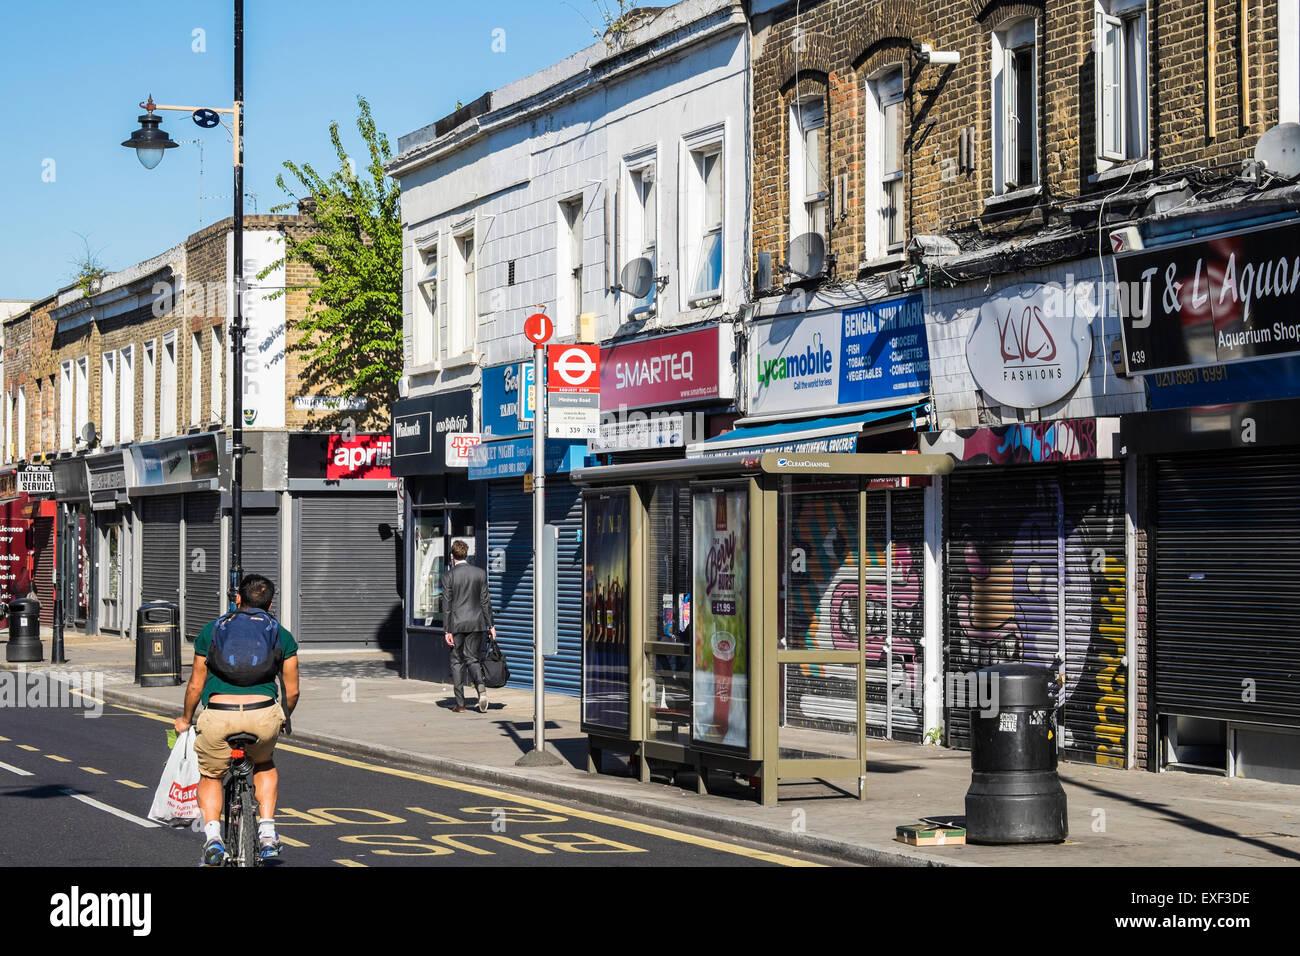 Roman road shops Borough of Tower Hamlets, London, England, UK. - Stock Image